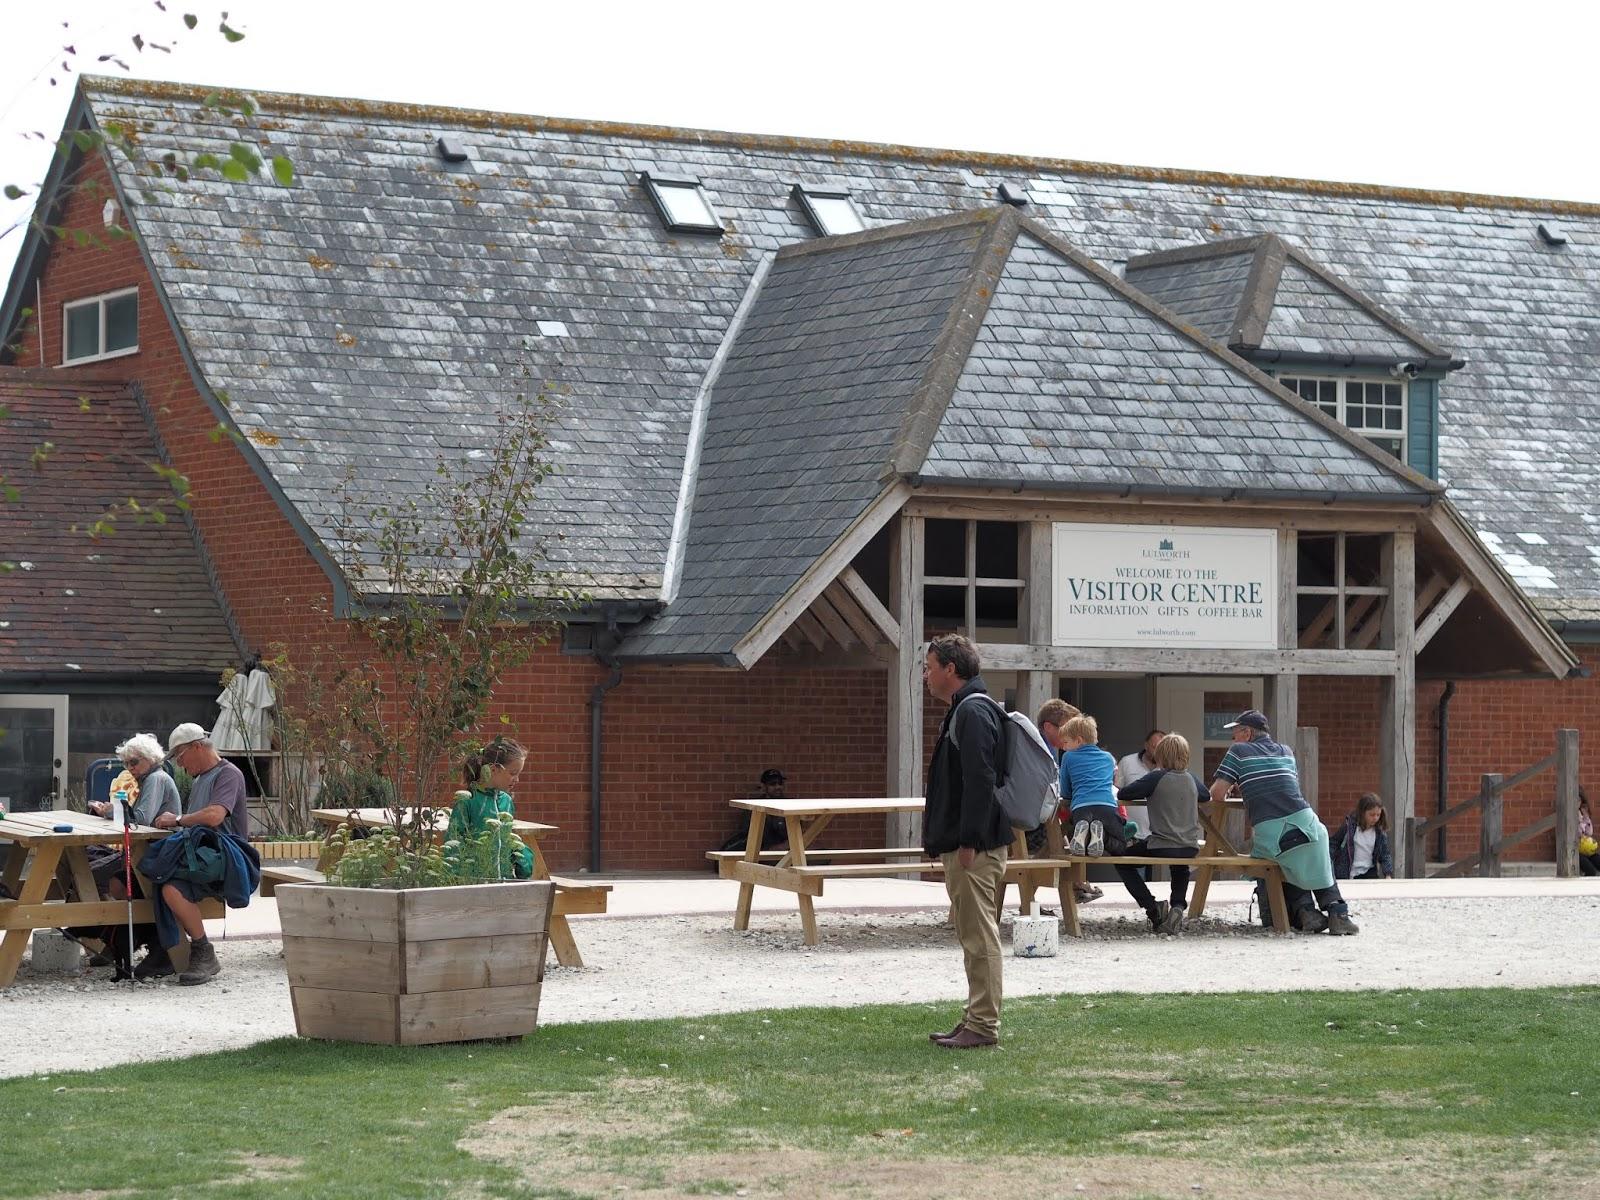 Lulworth Cove \ visitors information centre \ cafe \ shops